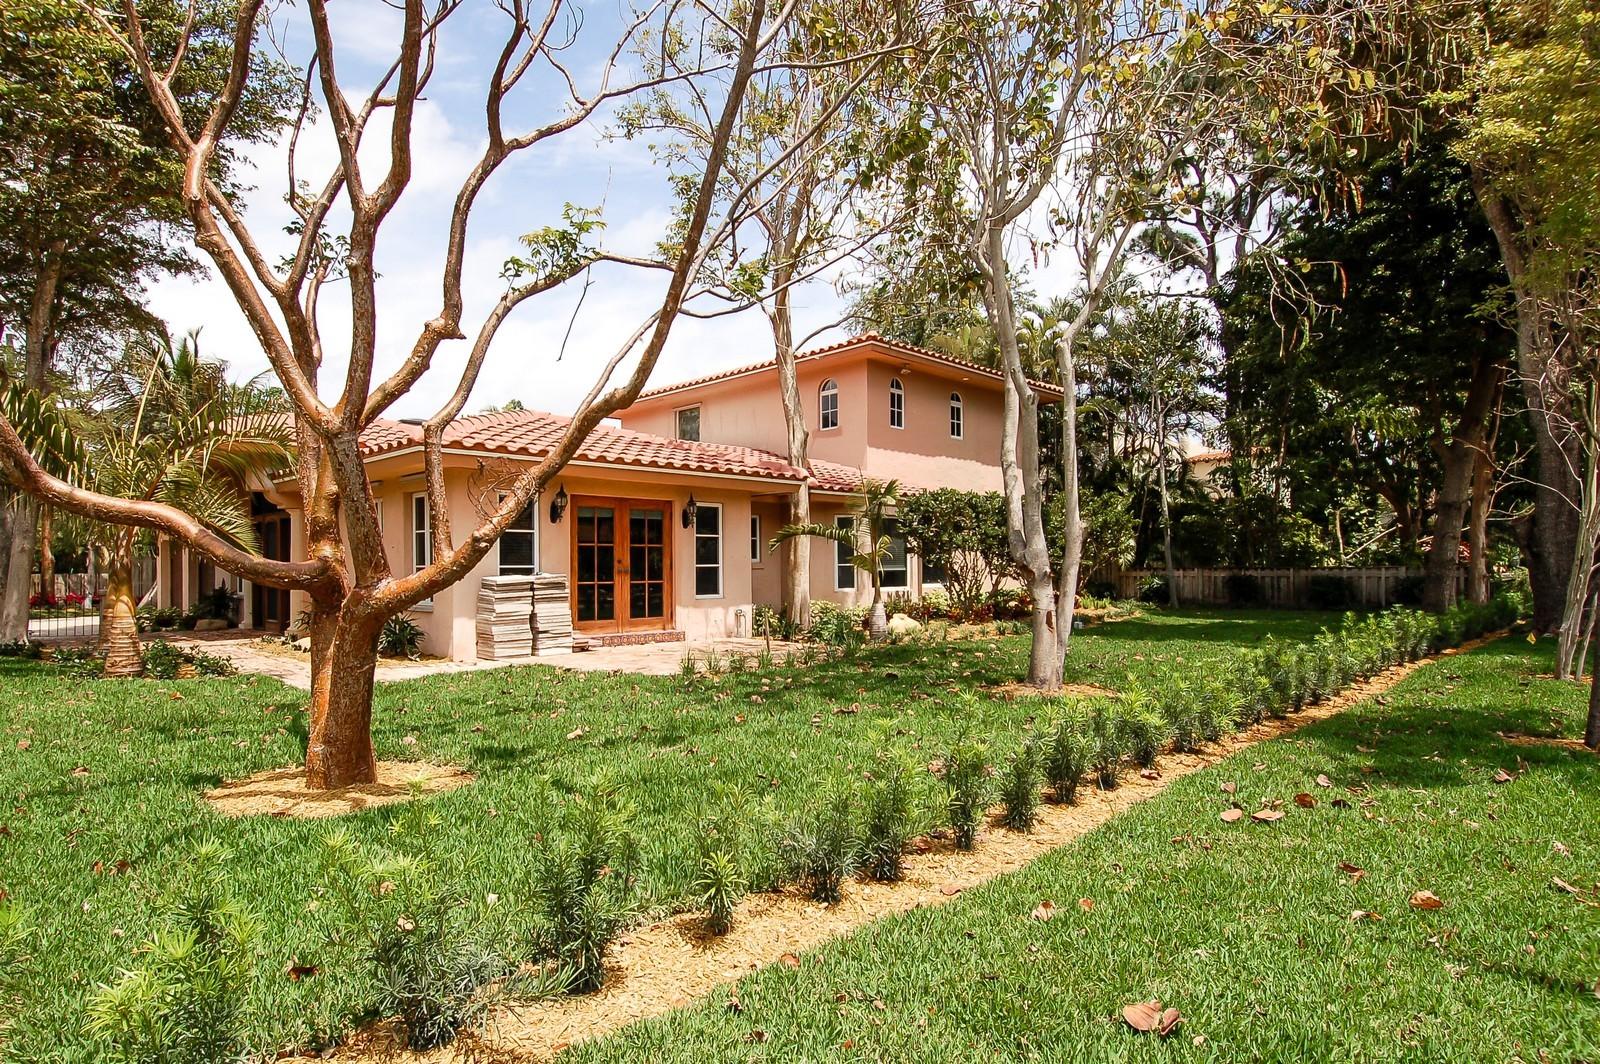 Real Estate Photography - 899 Azalea St, Boca Raton, FL, 33486 - Side Yard